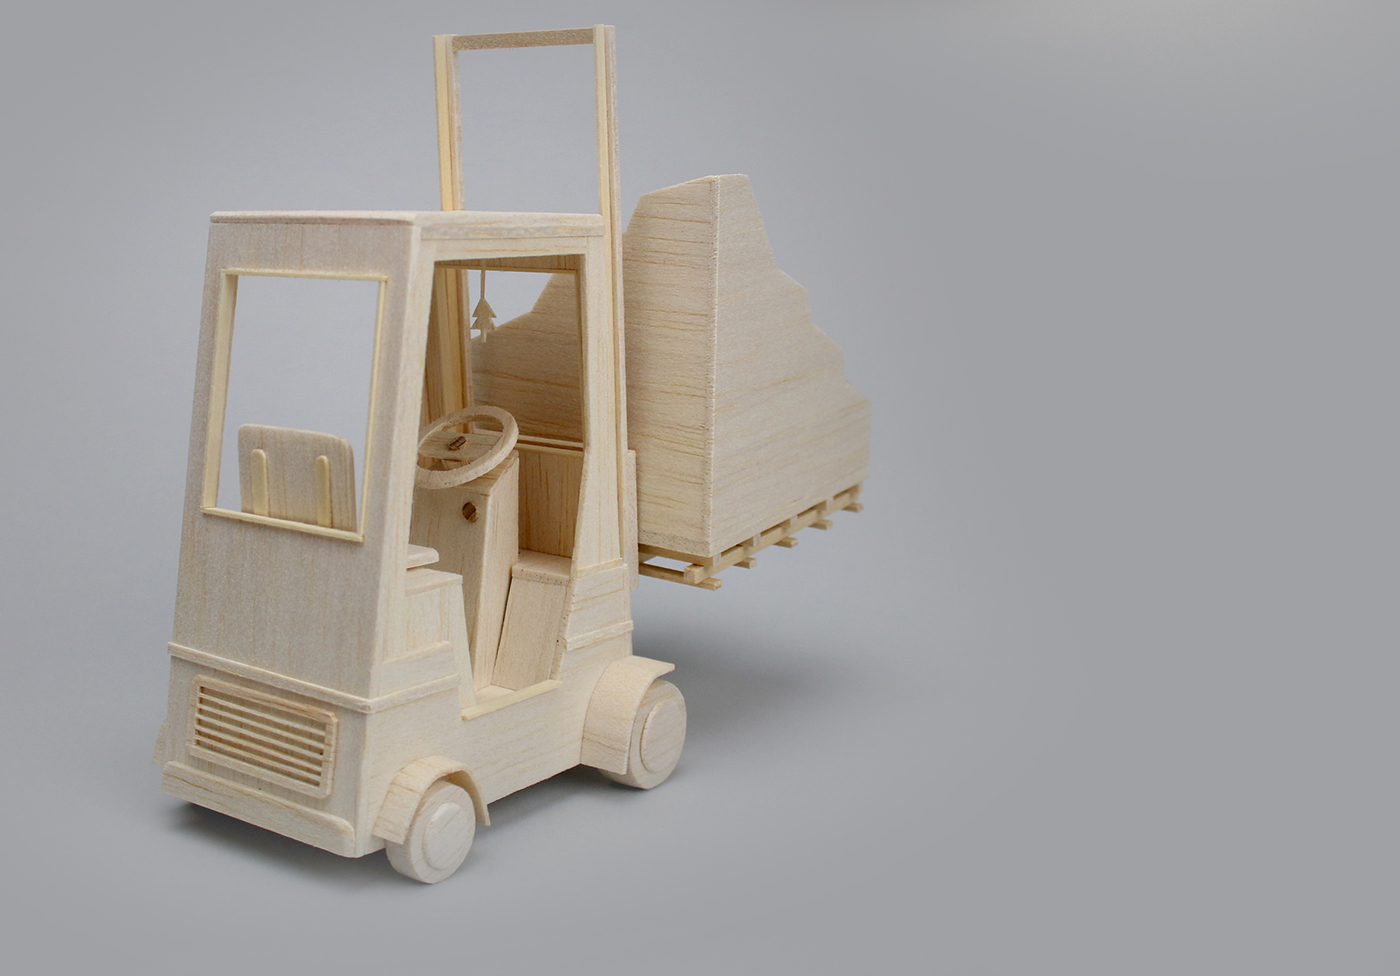 Balsa wood,Miniature,fork lift truck,car,mountain,story object,wood,maquette,model,scale model,sculpture